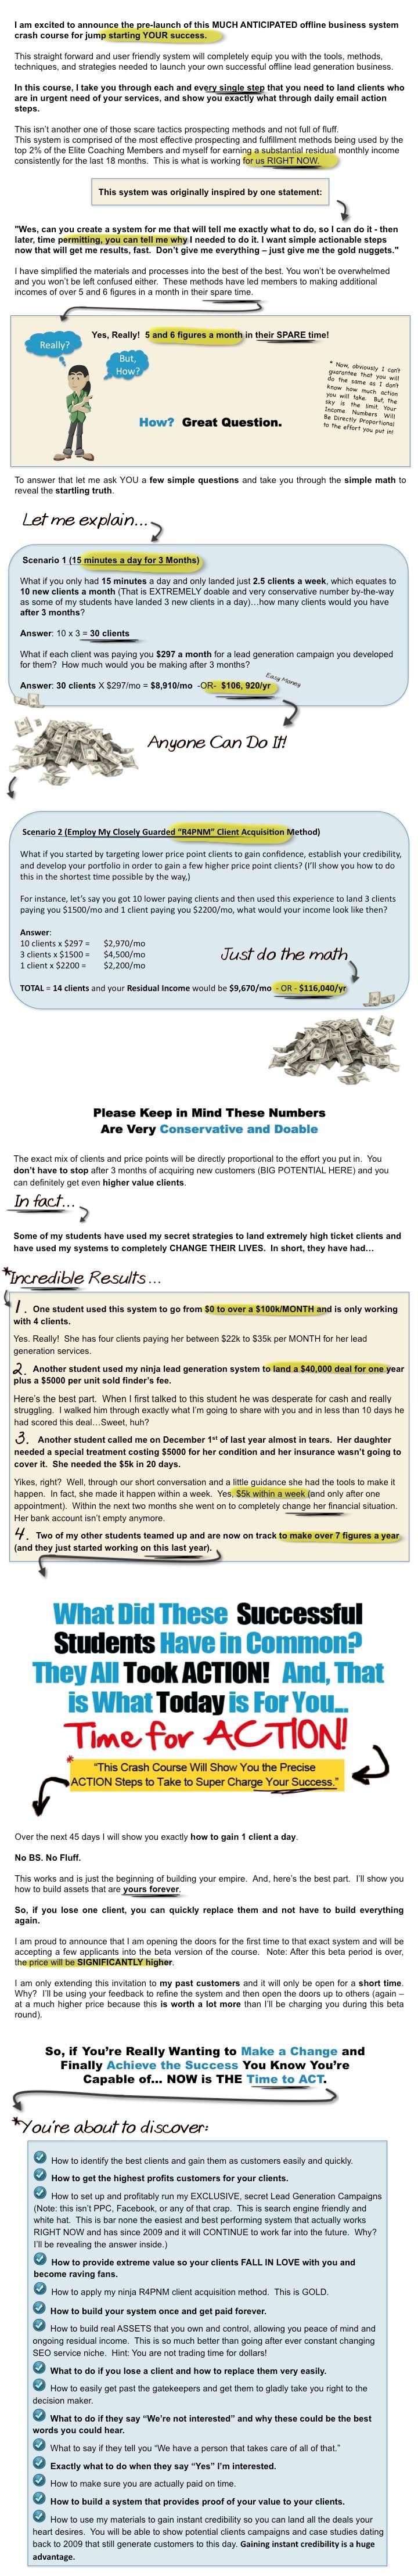 Offline Experts Academy Crash Course - 2